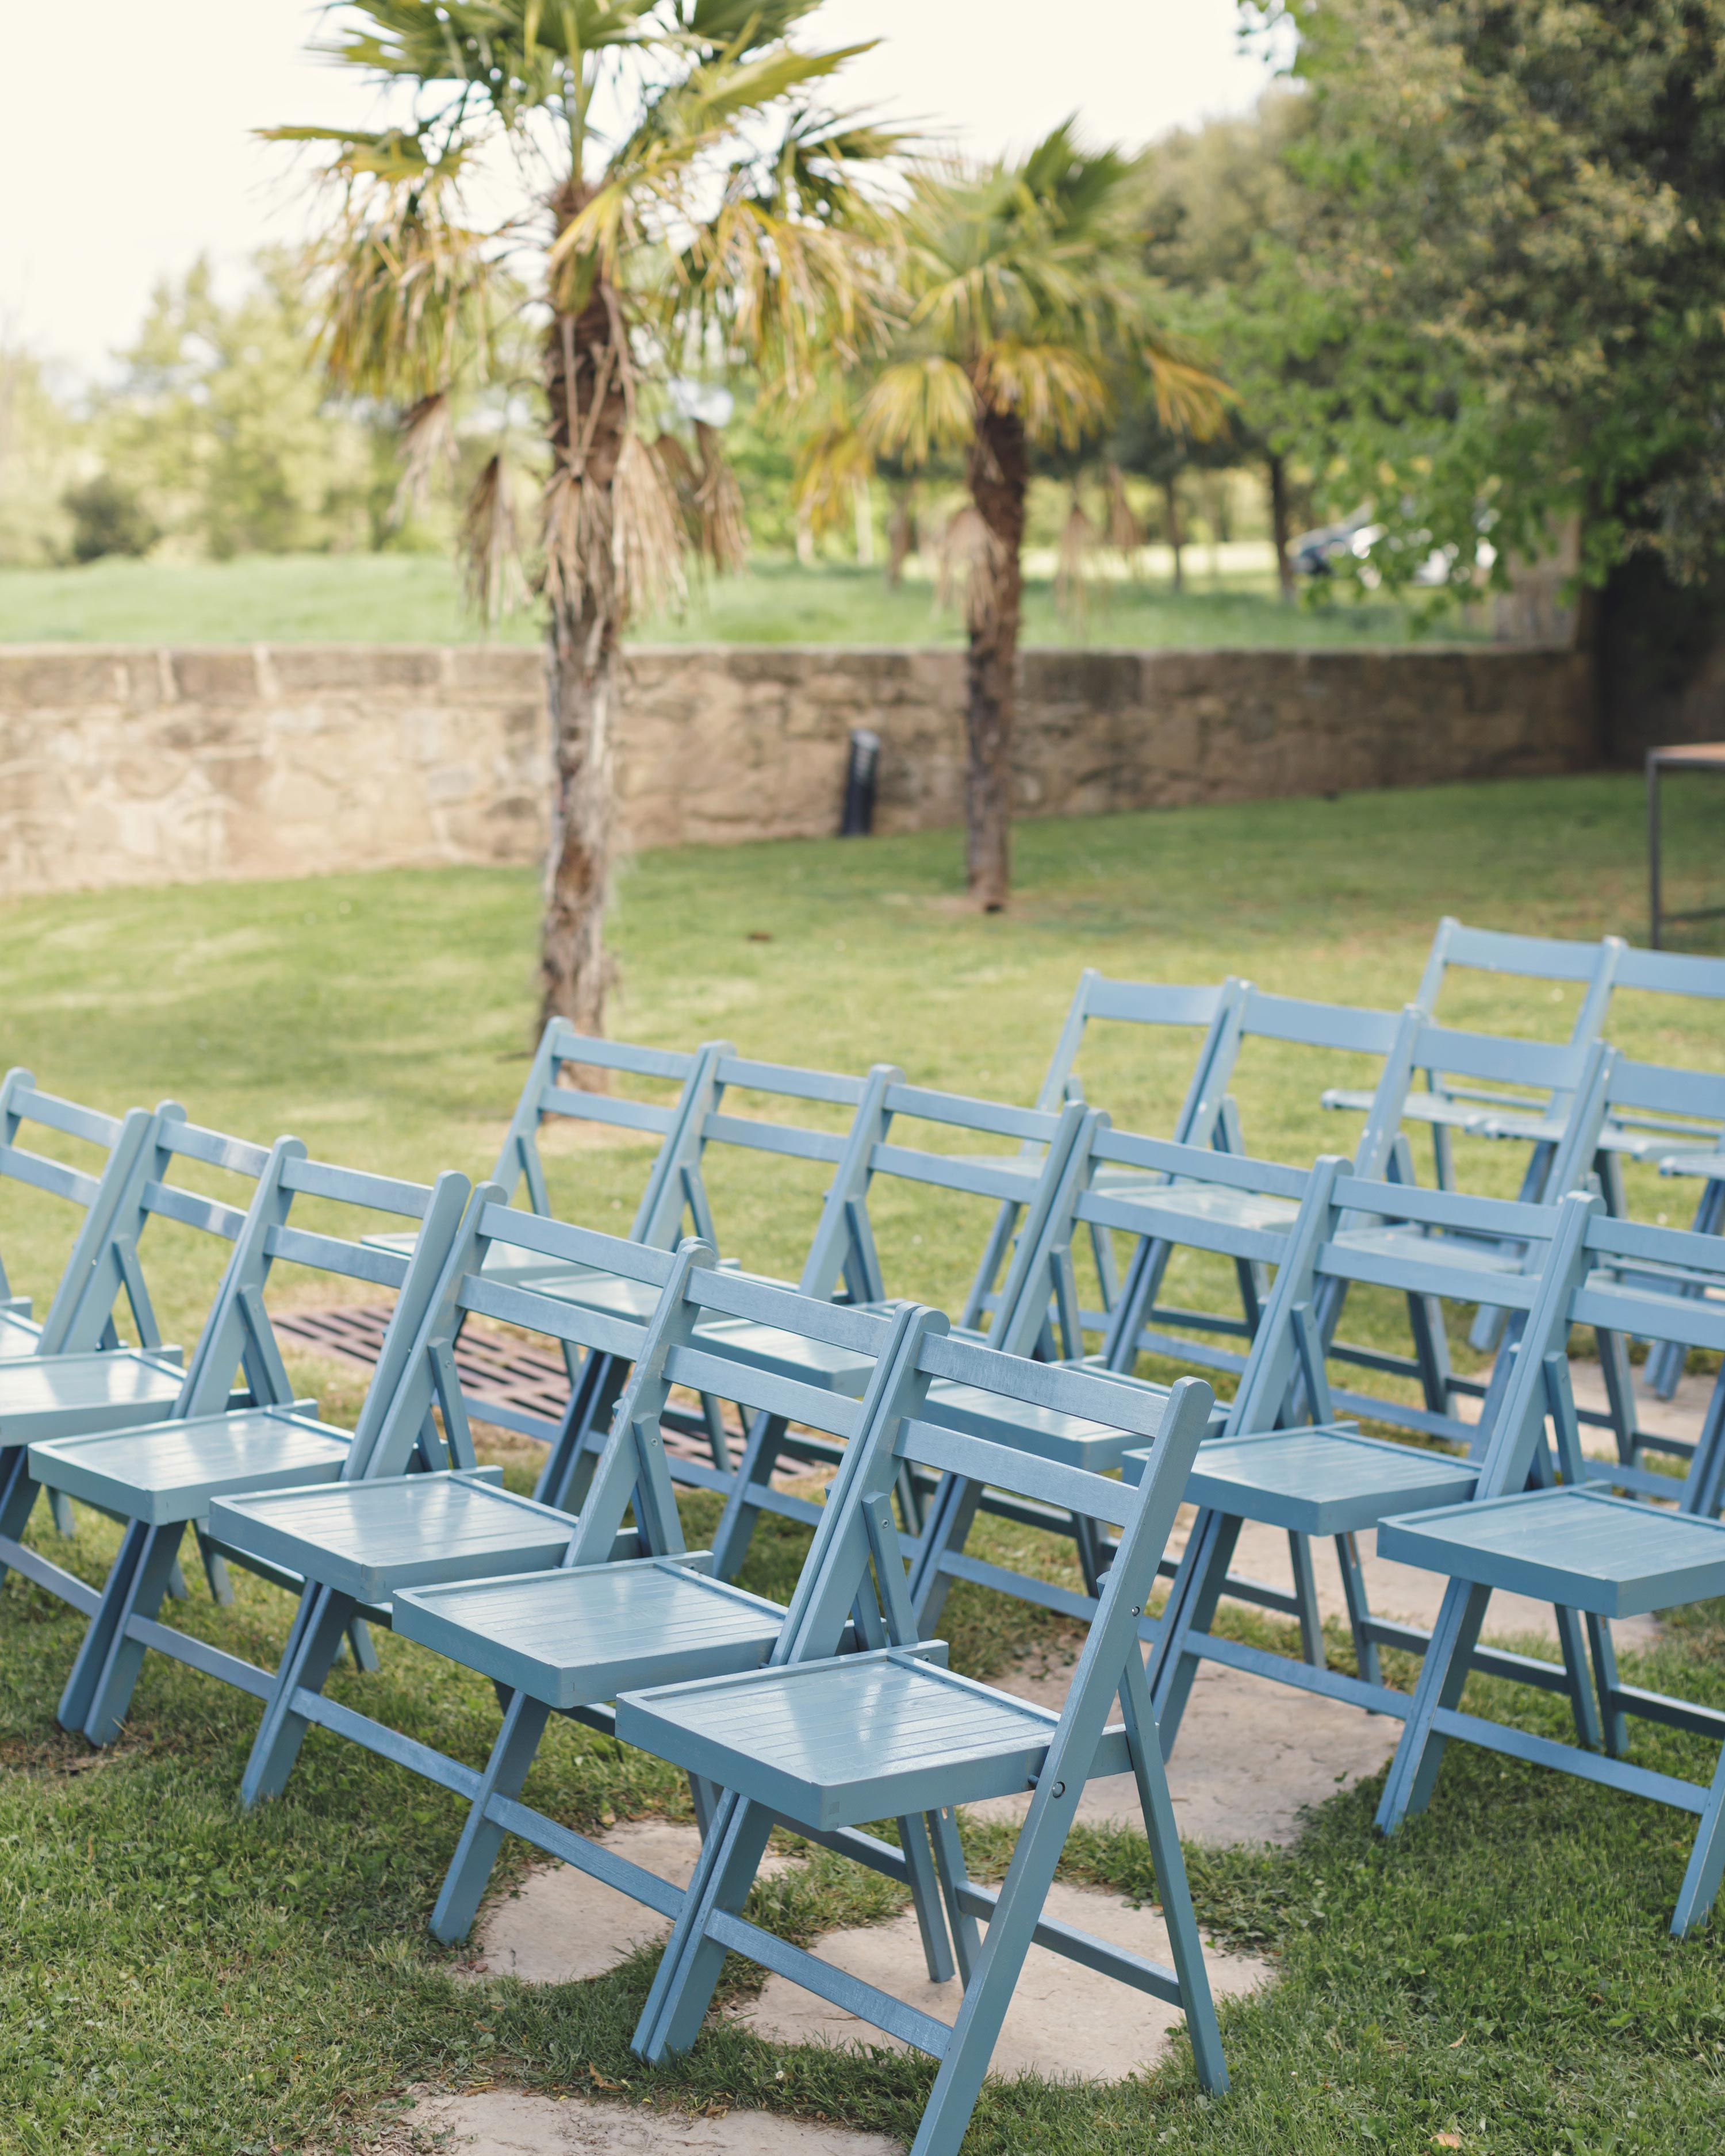 anna-ania-wedding-chairs-028-s112510-0216.jpg